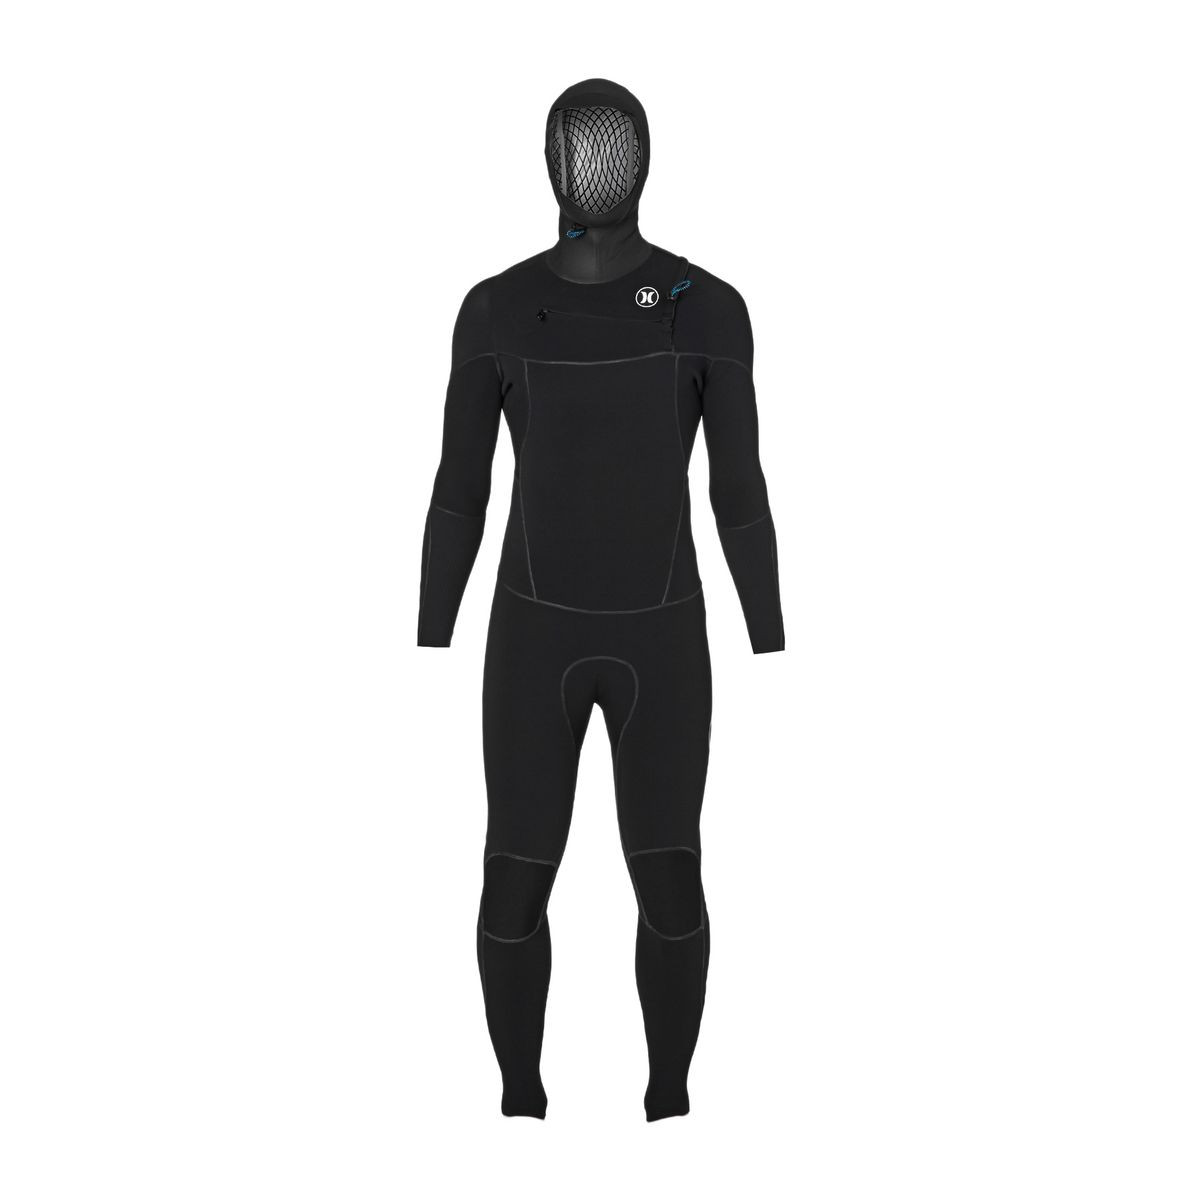 Hurley Phantom 4/3mm 2017 Chest Zip Hooded Wetsuit - Black